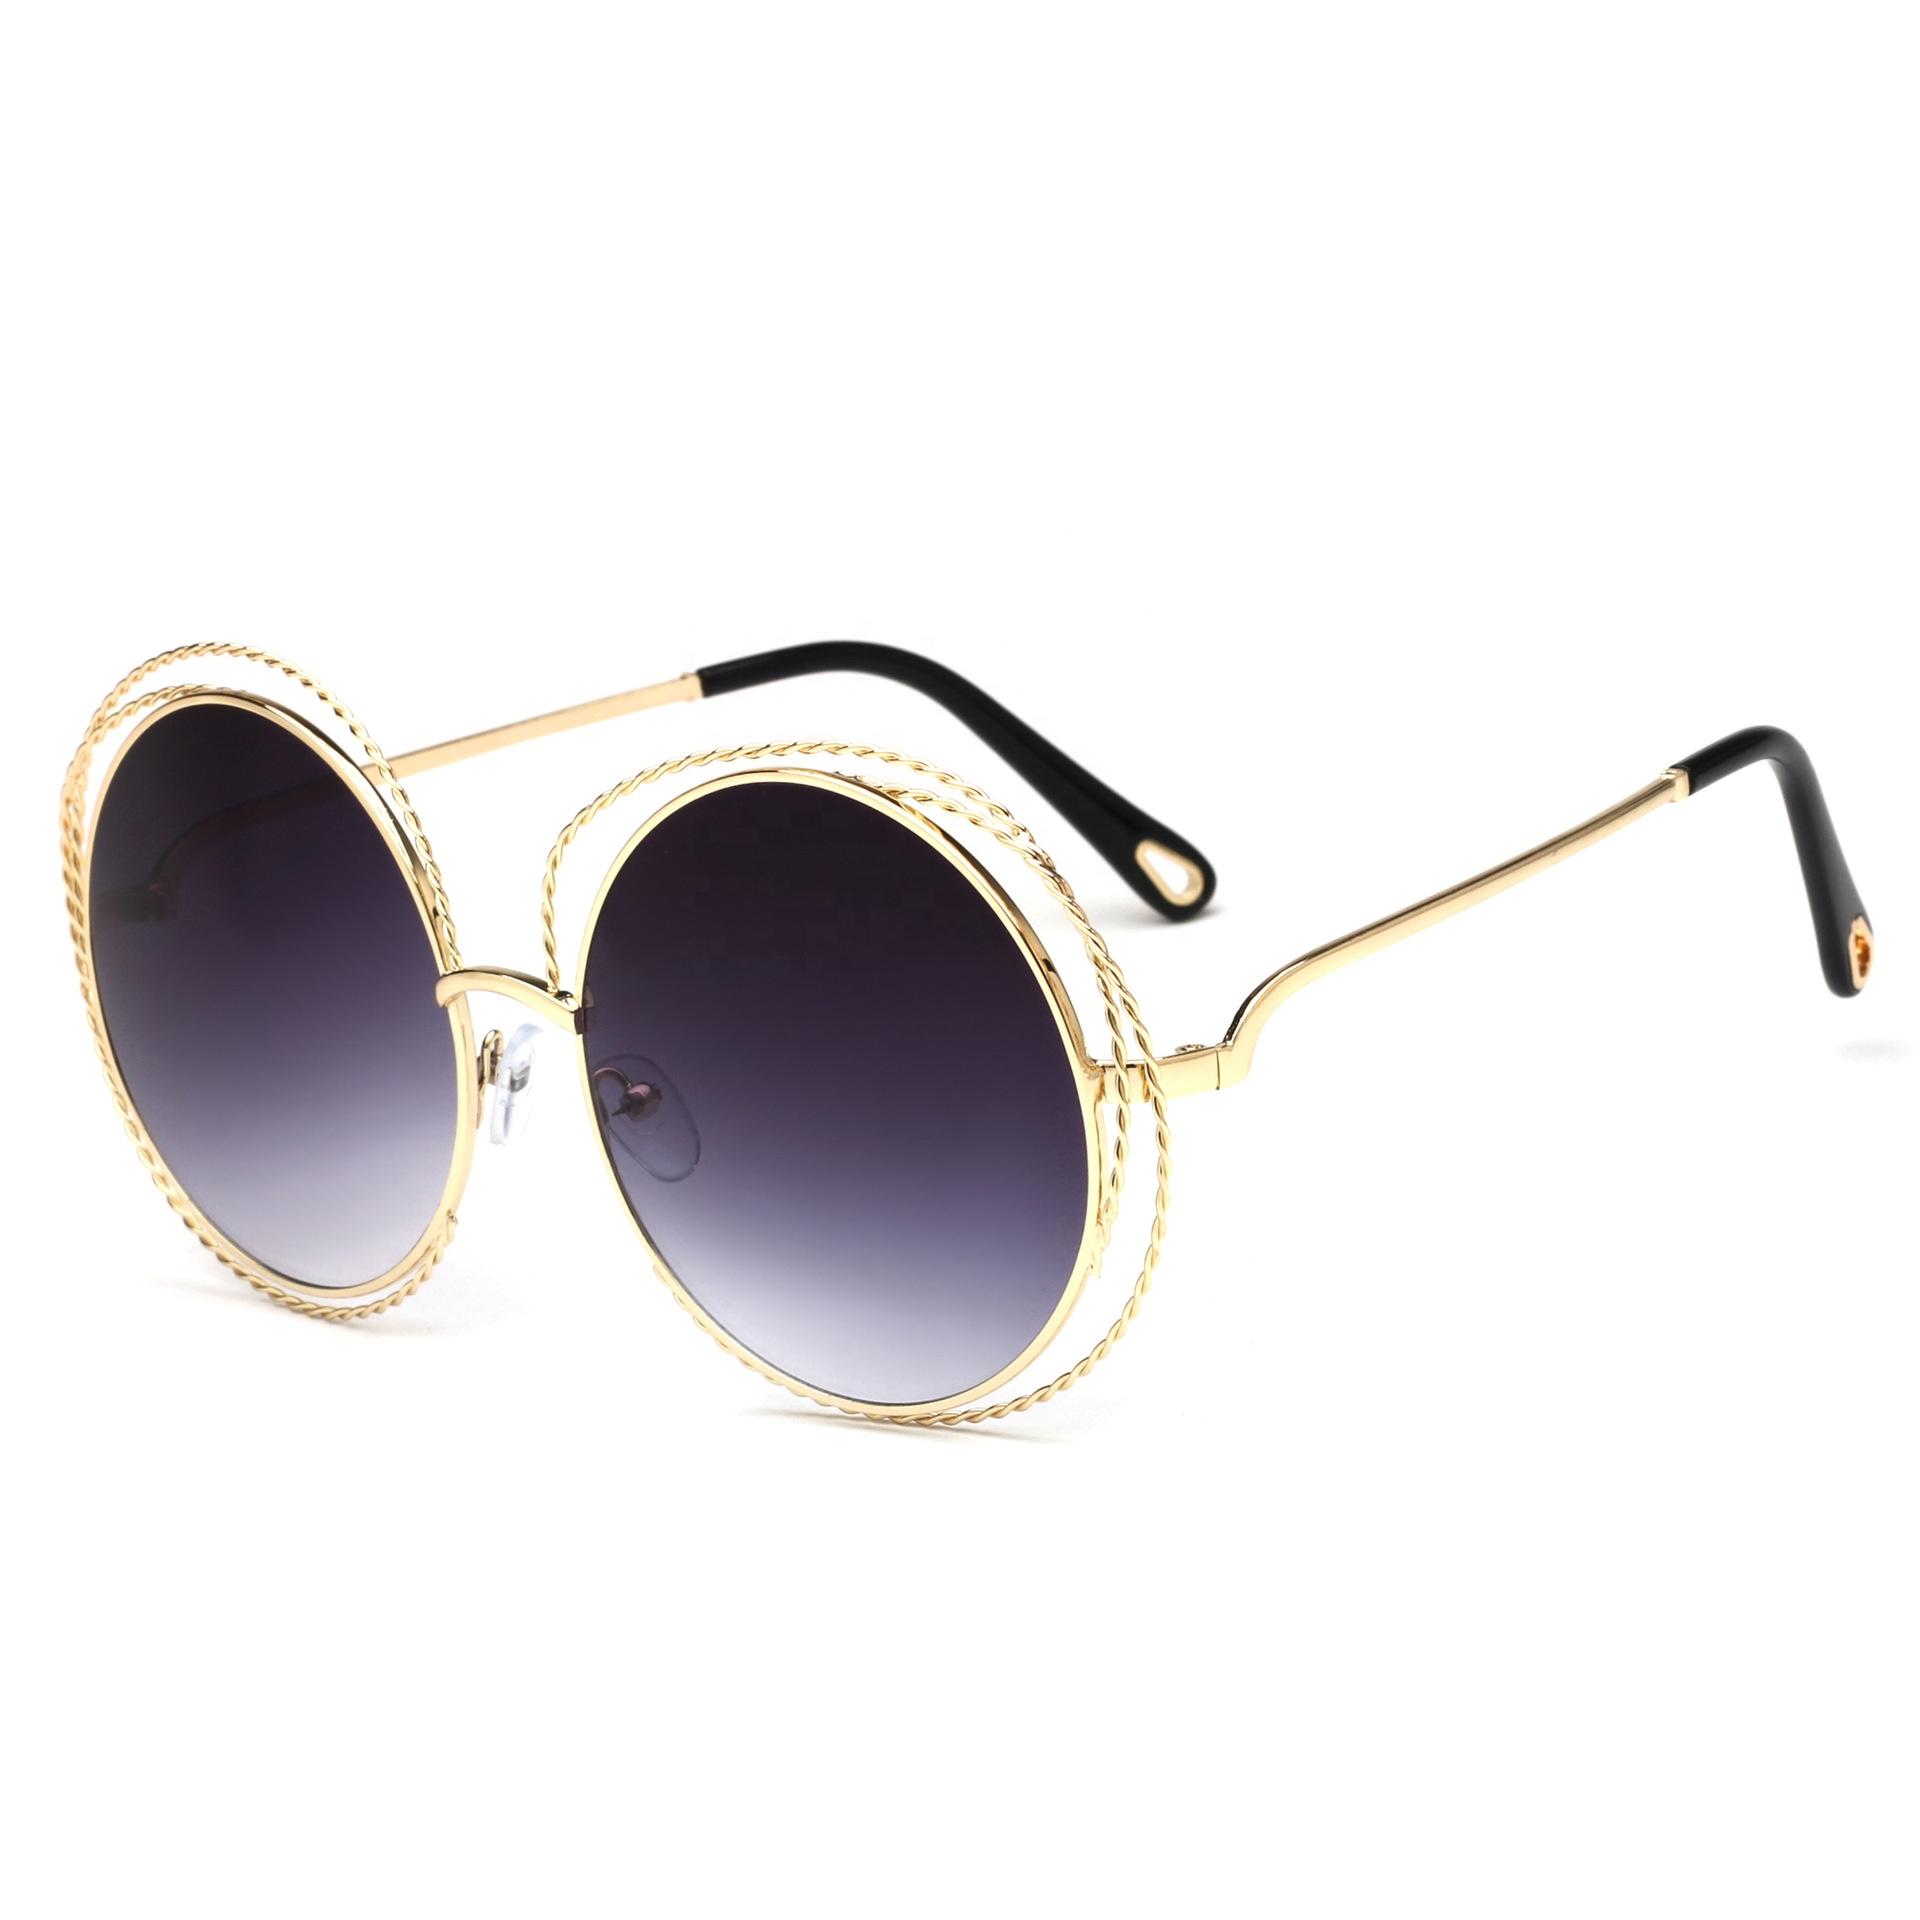 Shihan S129 Trending sunglasses 2019 korean sunglasses image фото